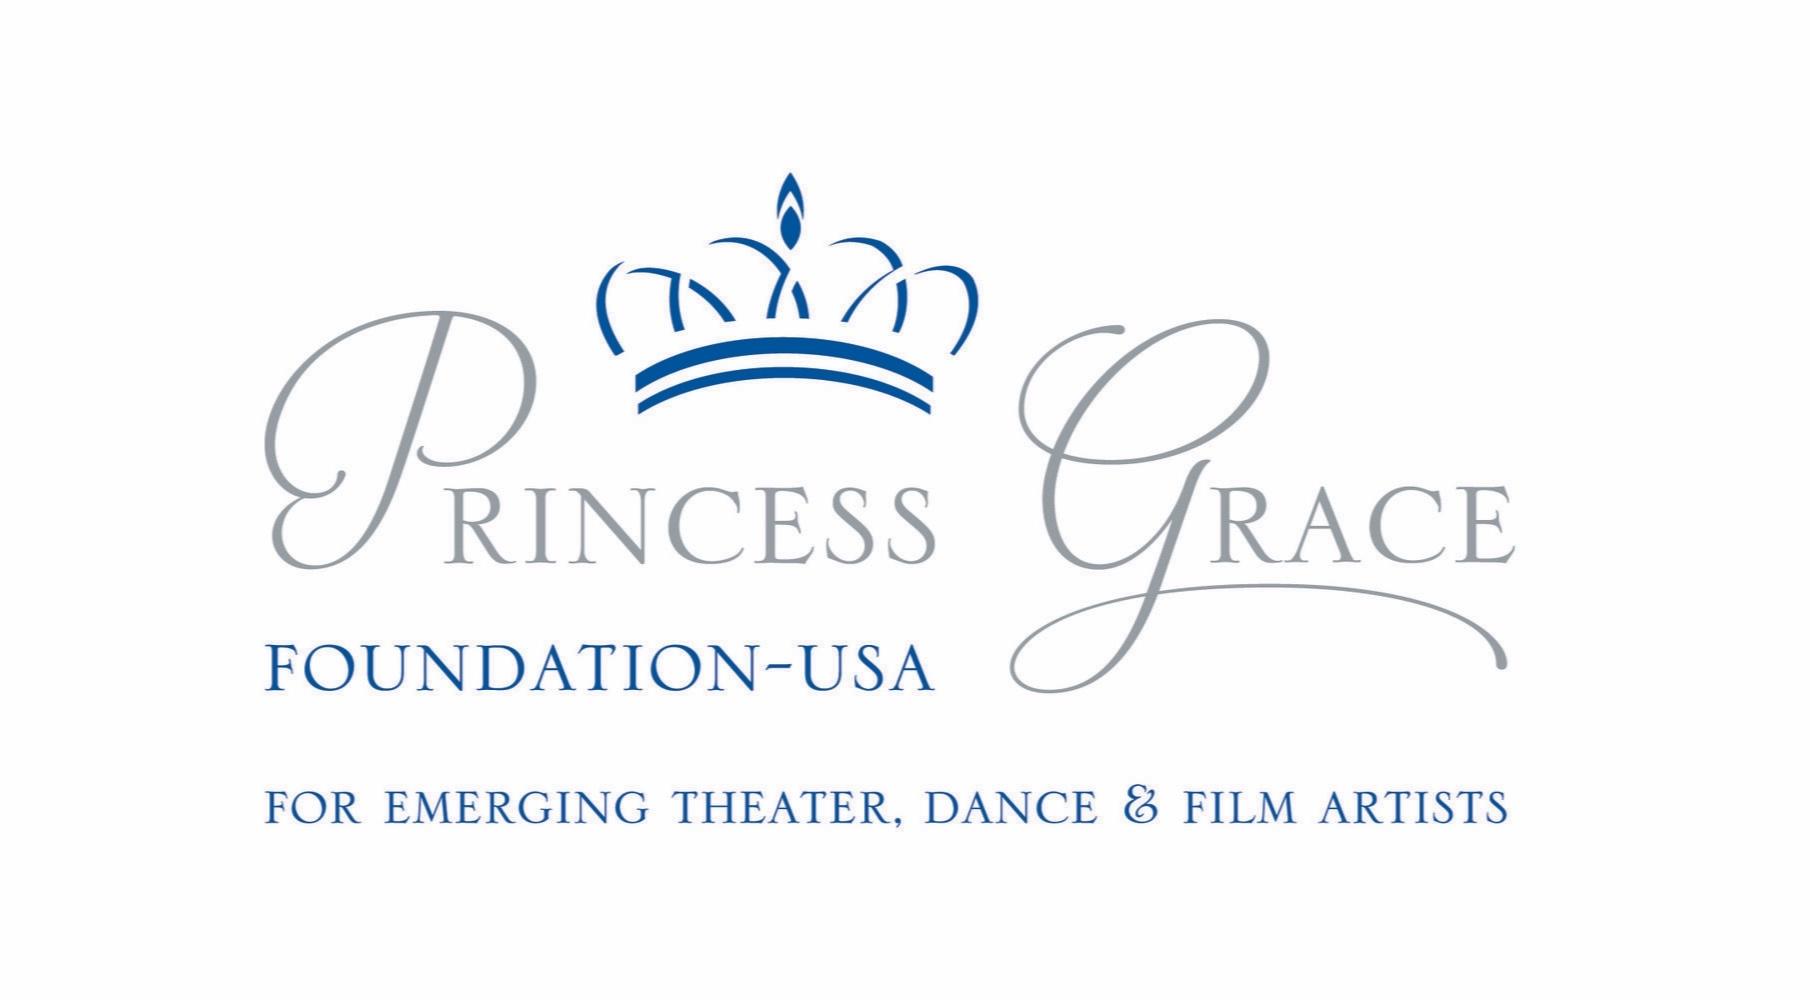 Princess Grace Foundation logo with Tag Line_4CP.jpg